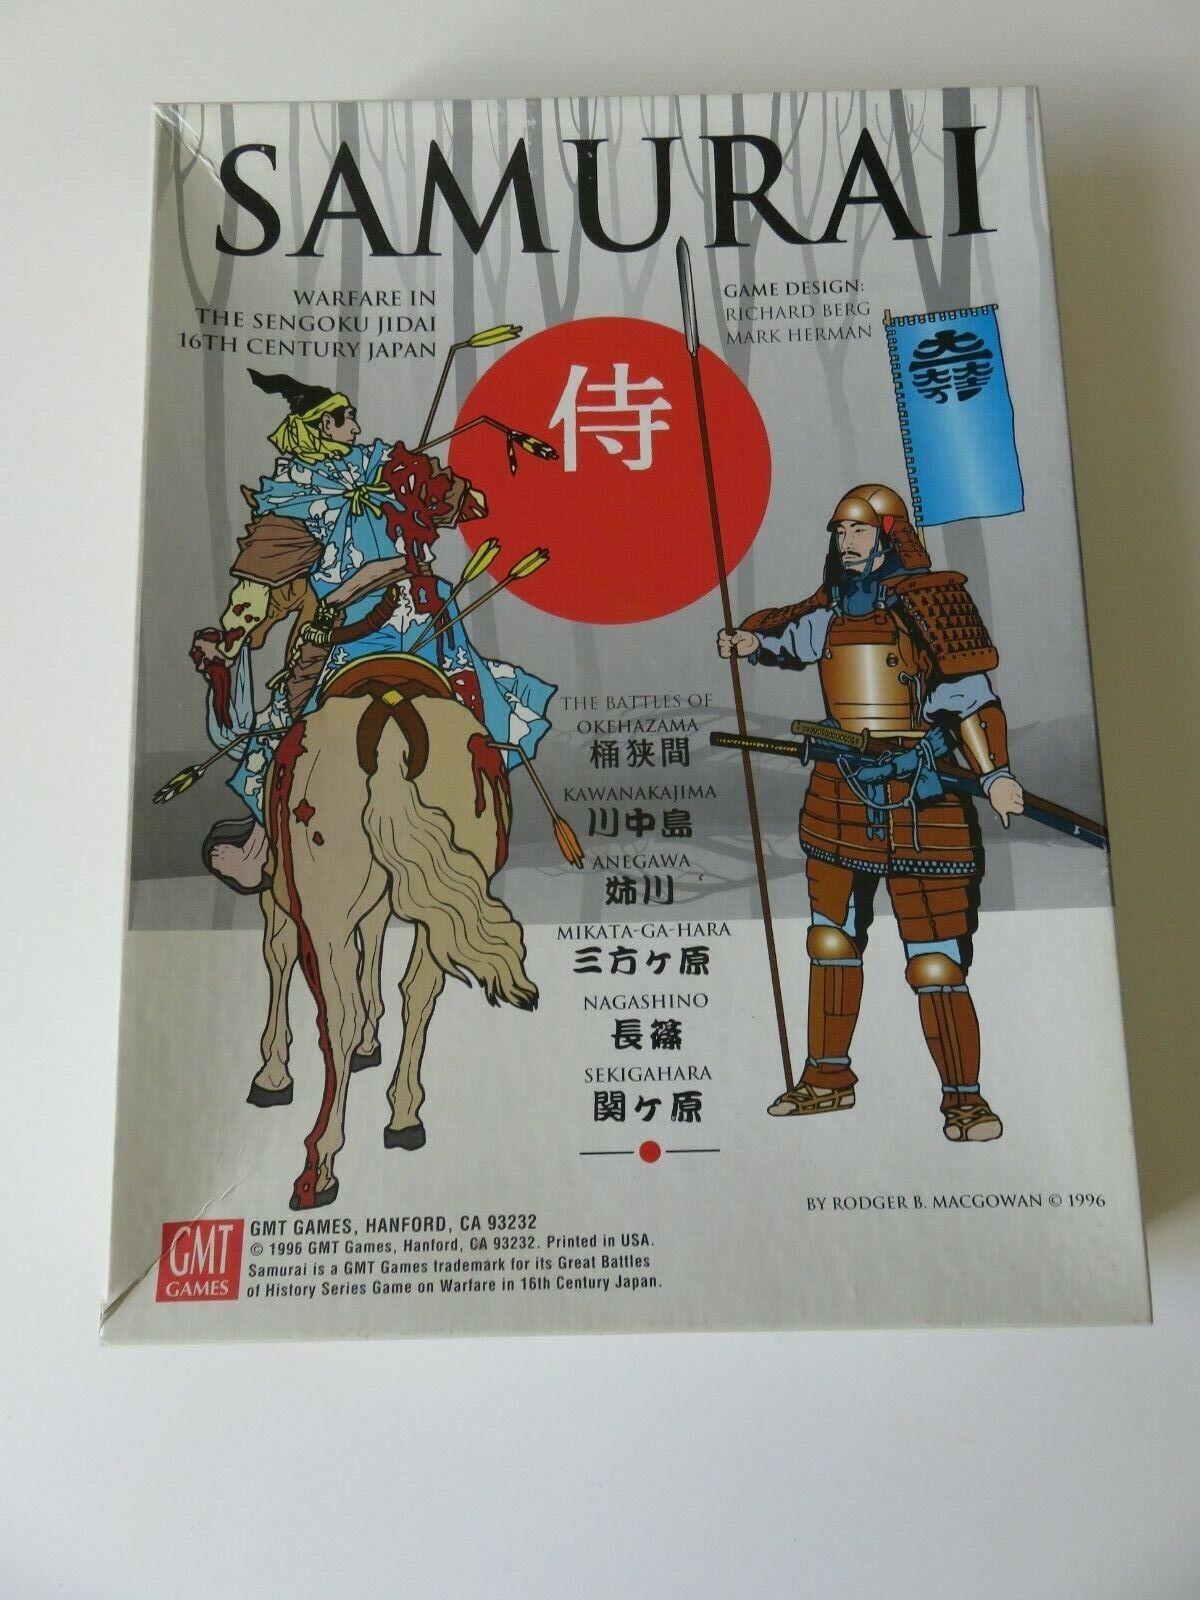 JEU SAMURAI WARFARE IN 16TH CENTURY JAPAN GMT GAMES WAREGAME  JEU STRATEGIE 1996  meilleure qualité meilleur prix